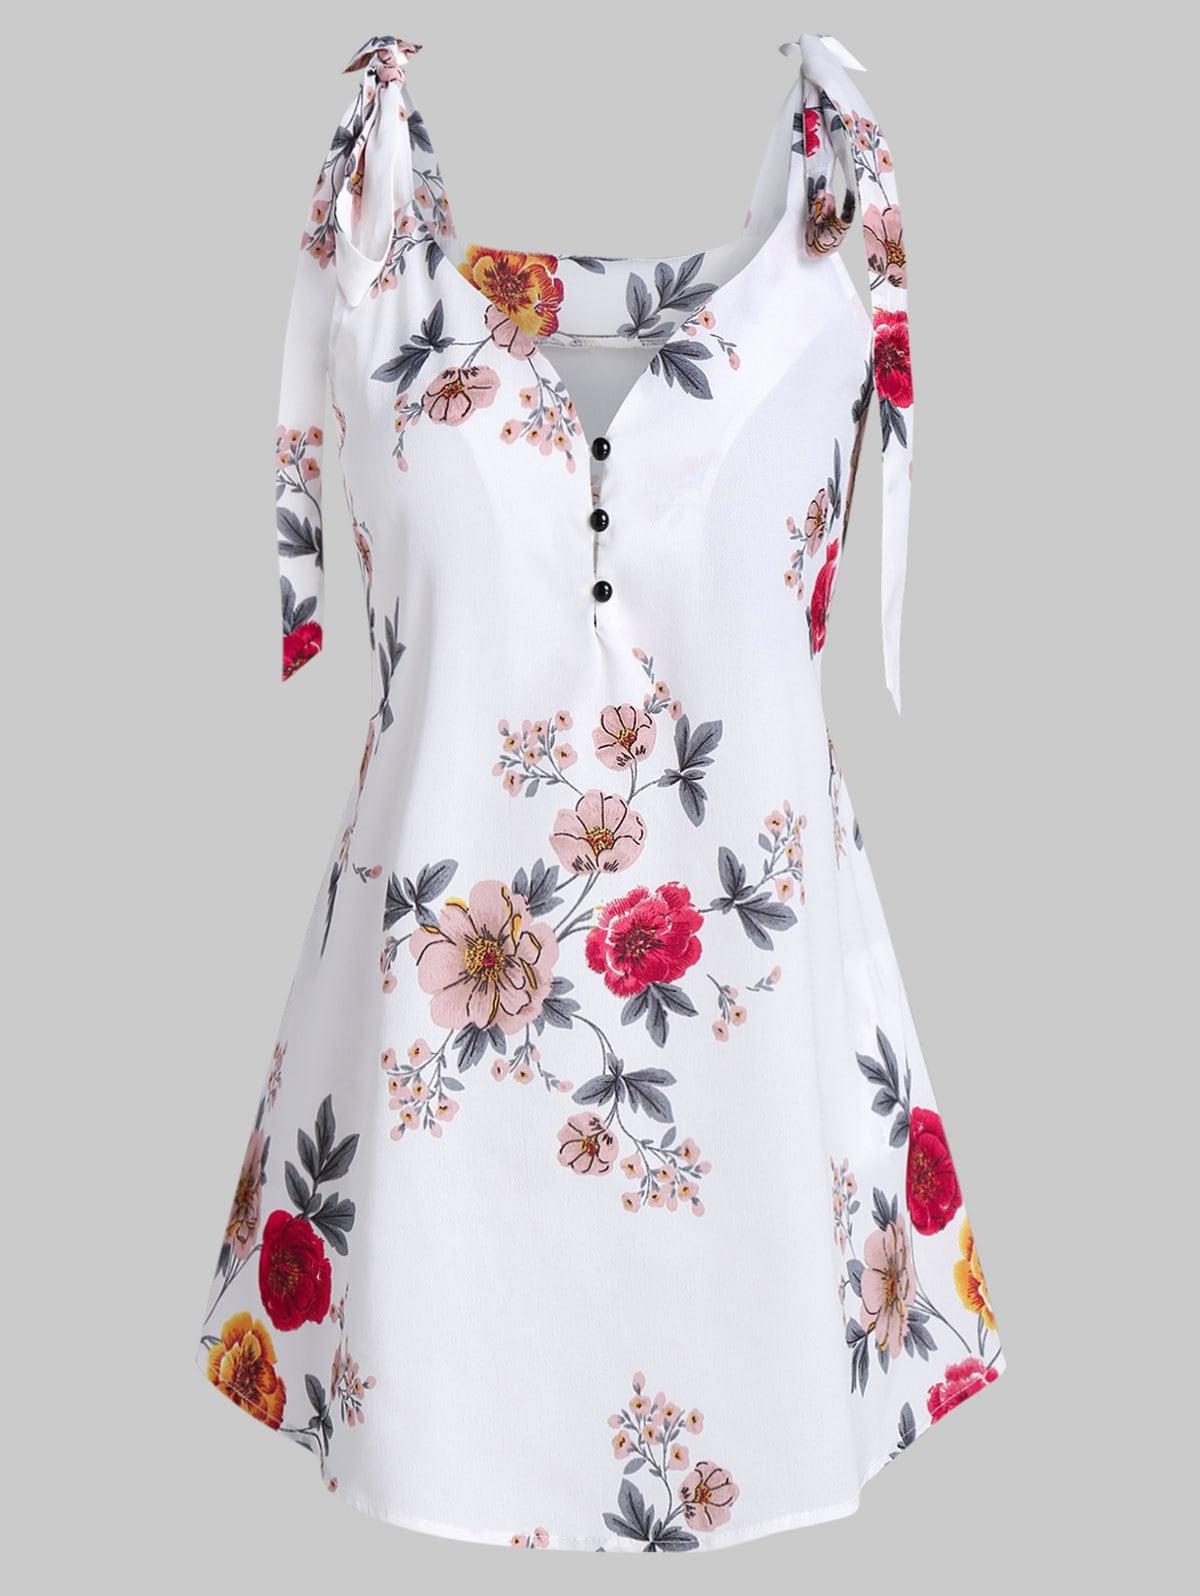 Floral Print Bowknot Half Button Tank Top